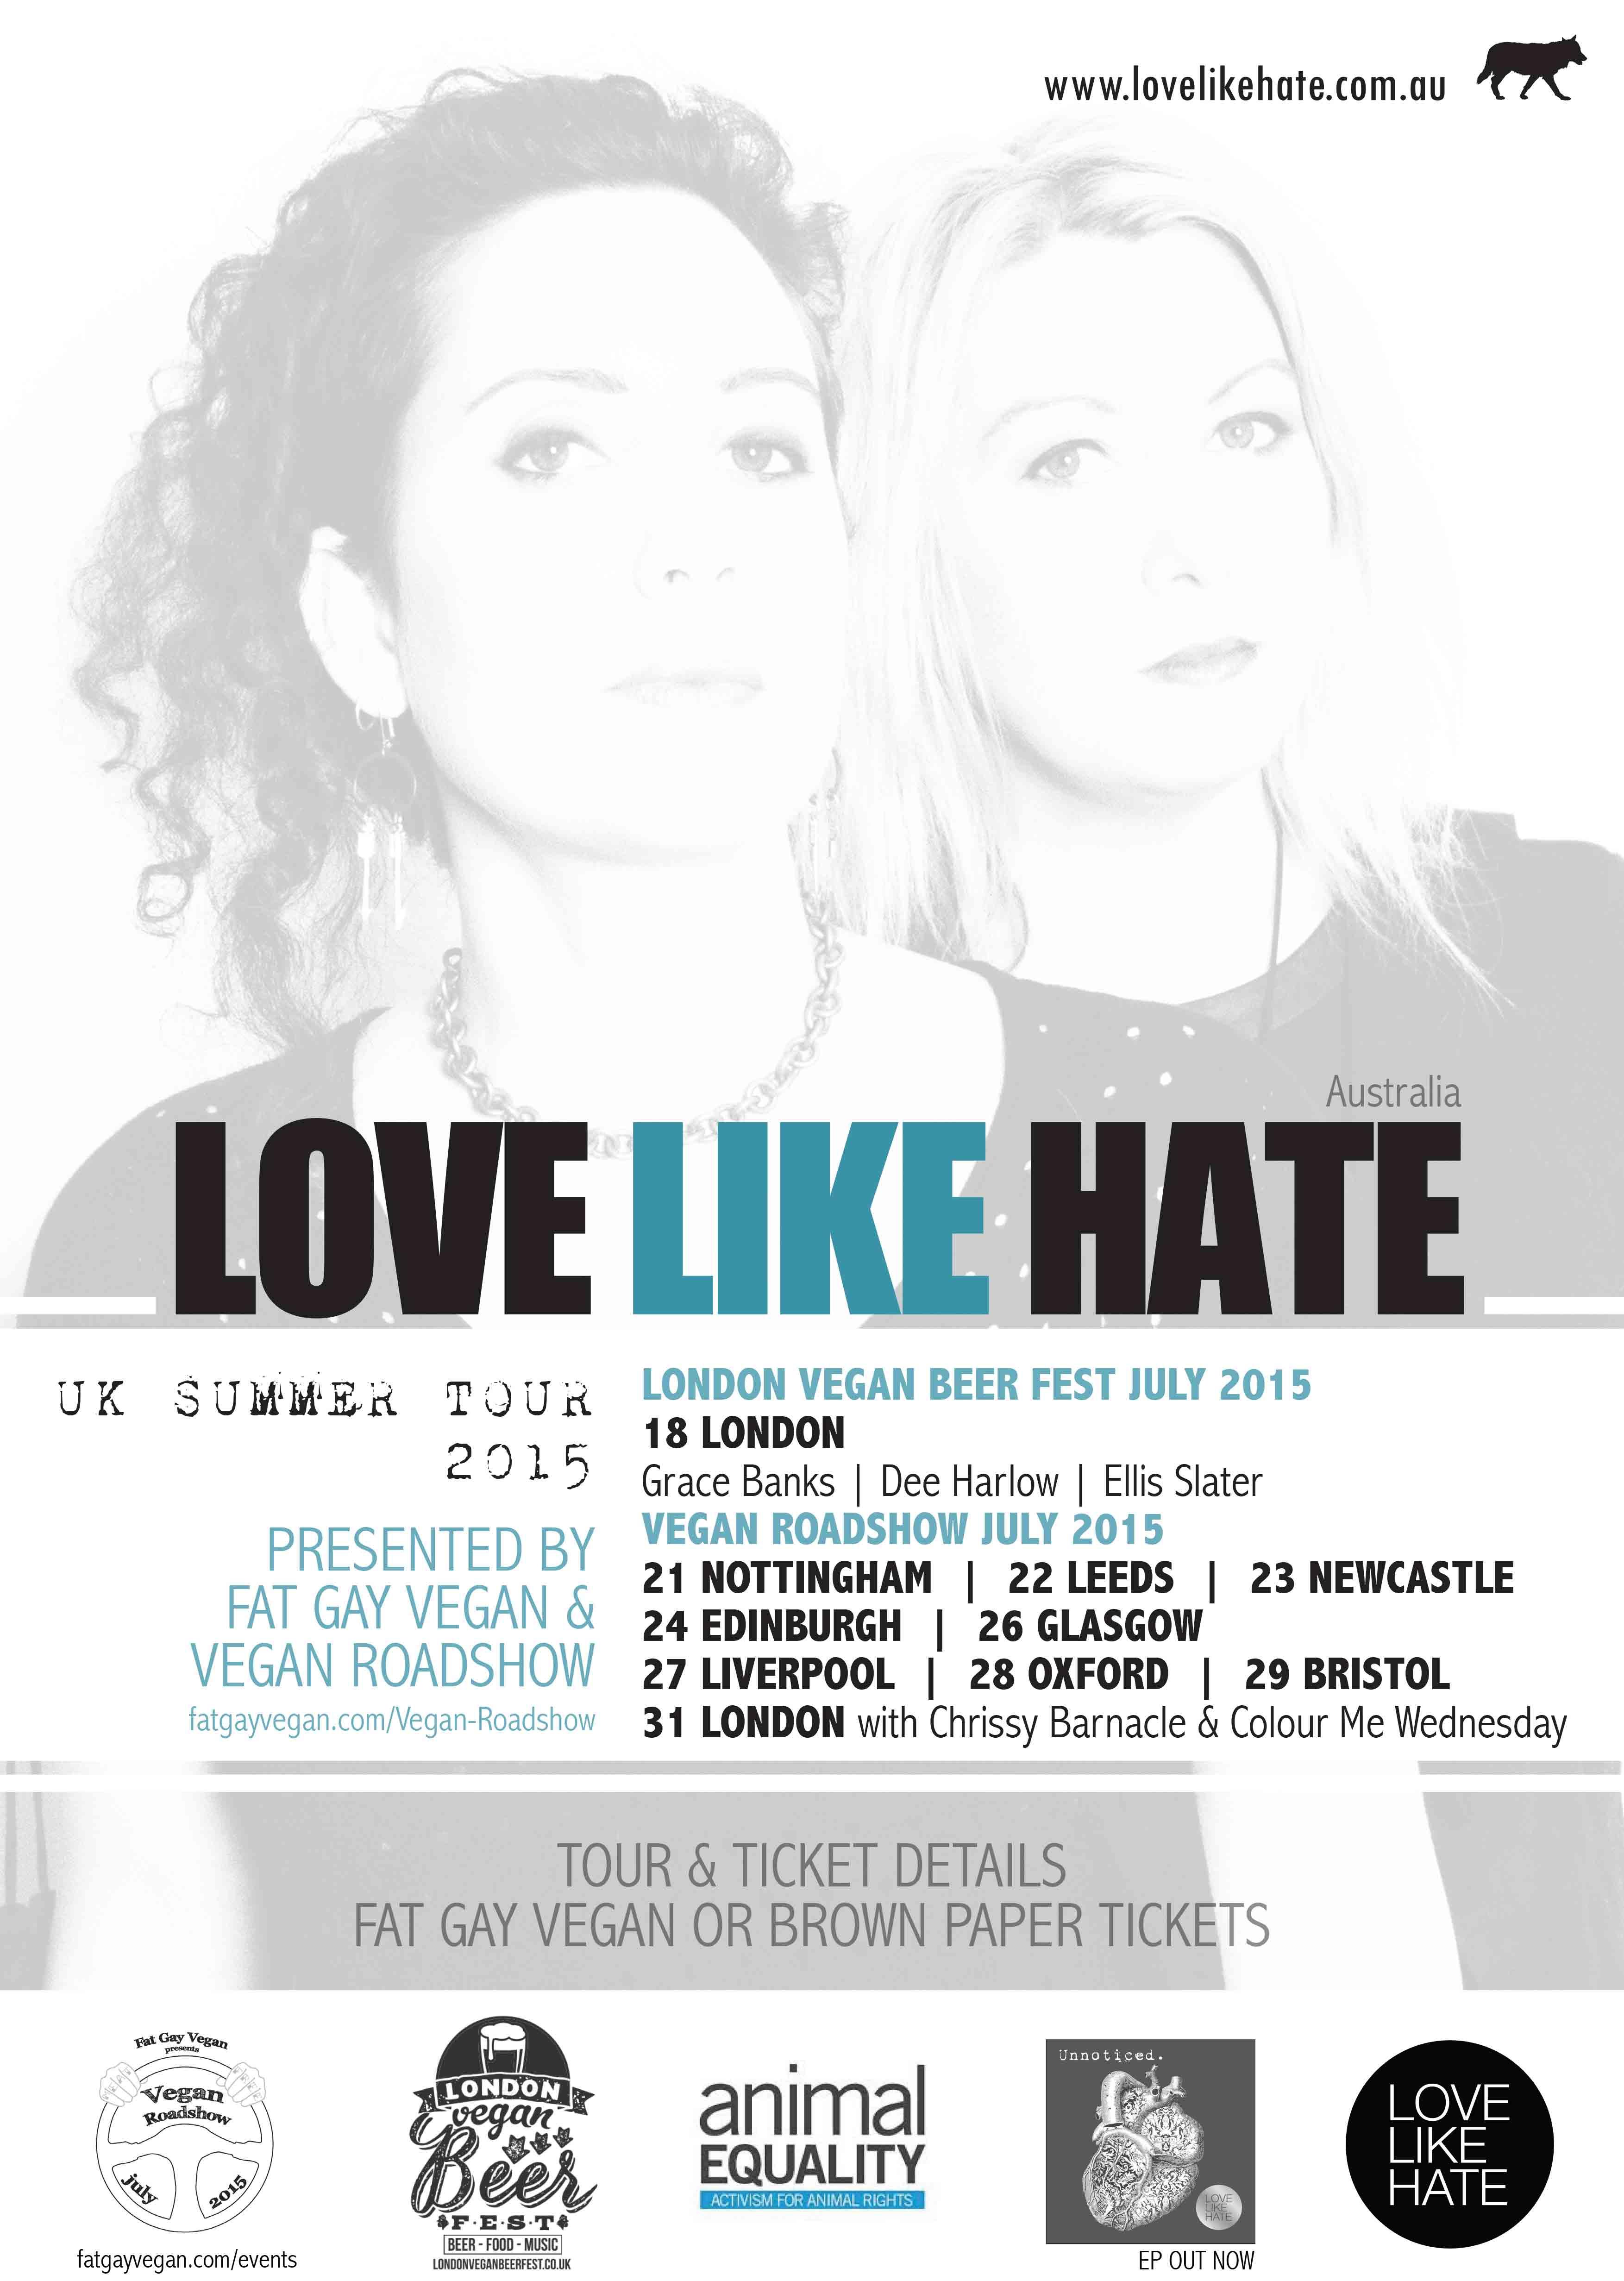 http://i2.wp.com/fatgayvegan.com/wp-content/uploads/2015/04/LoveLikeHate-2015-Tour-UK-2.jpg